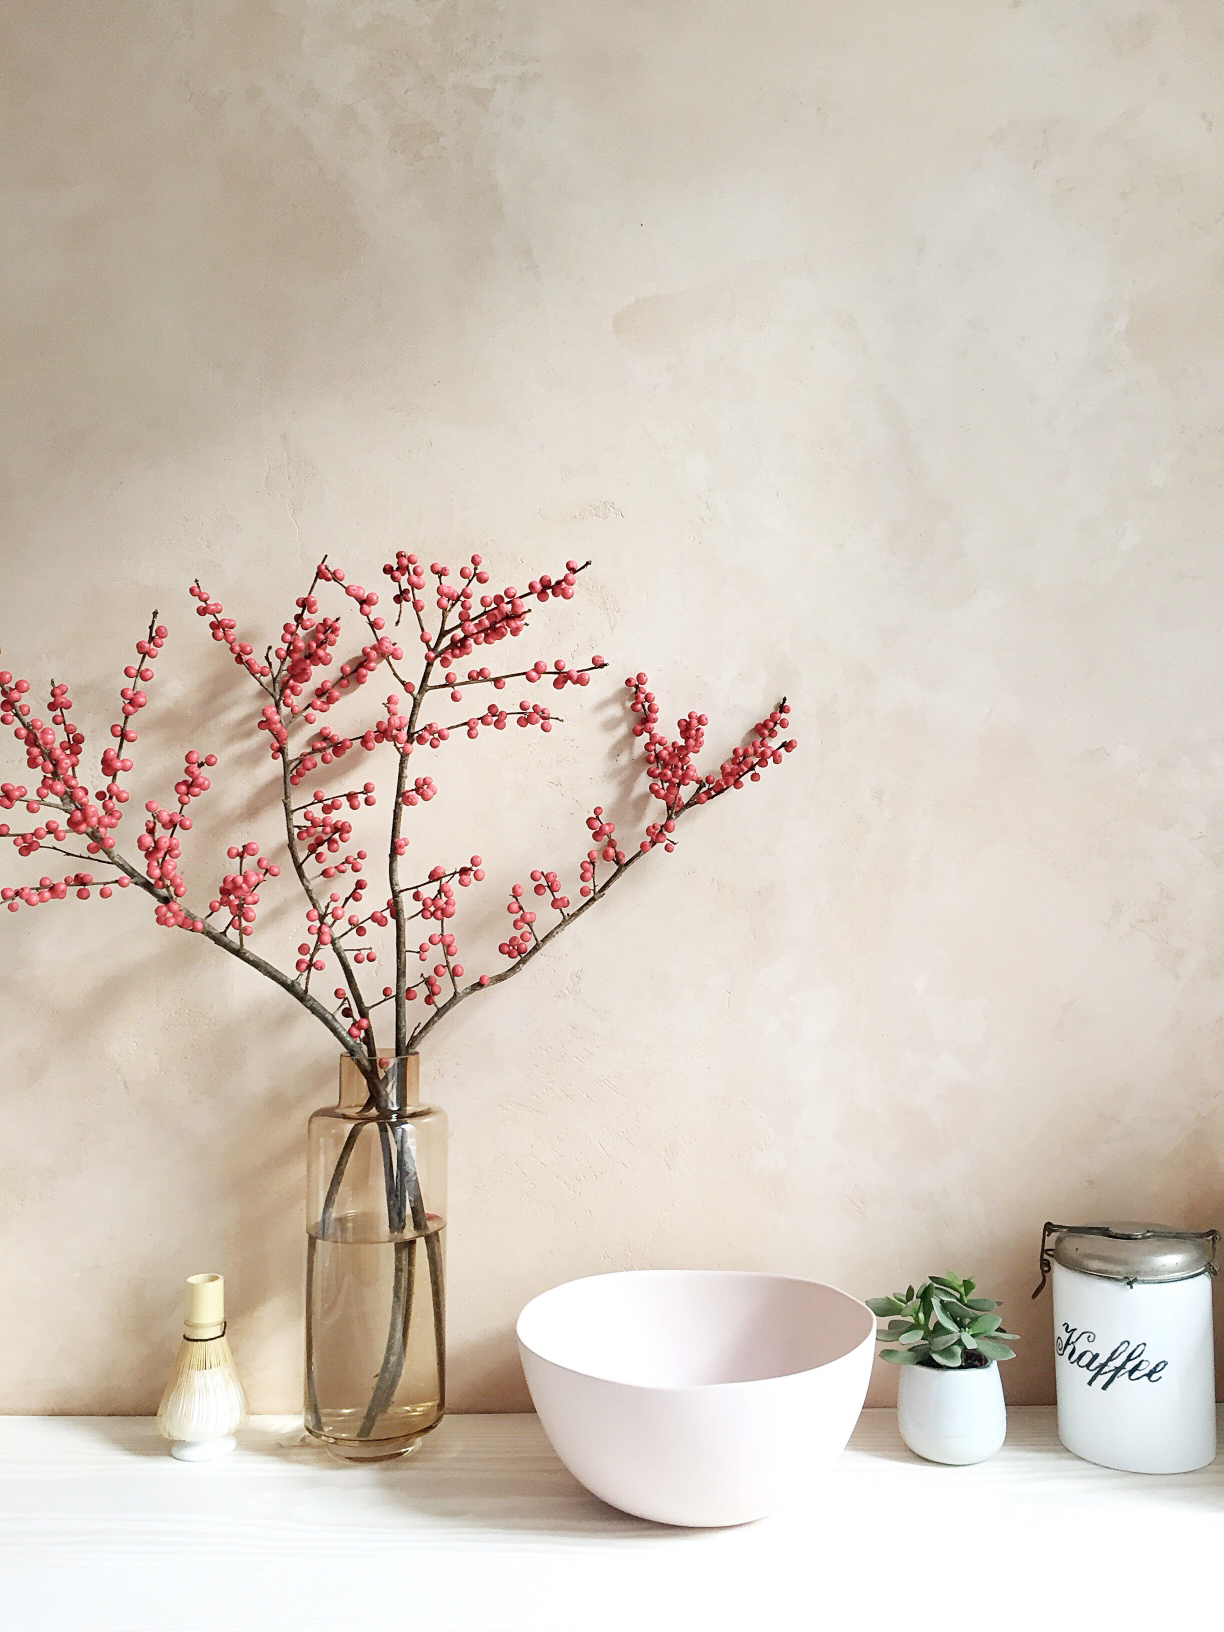 espanyolet_patina_wall_pigmented_microcement_Kitchen wall.jpg